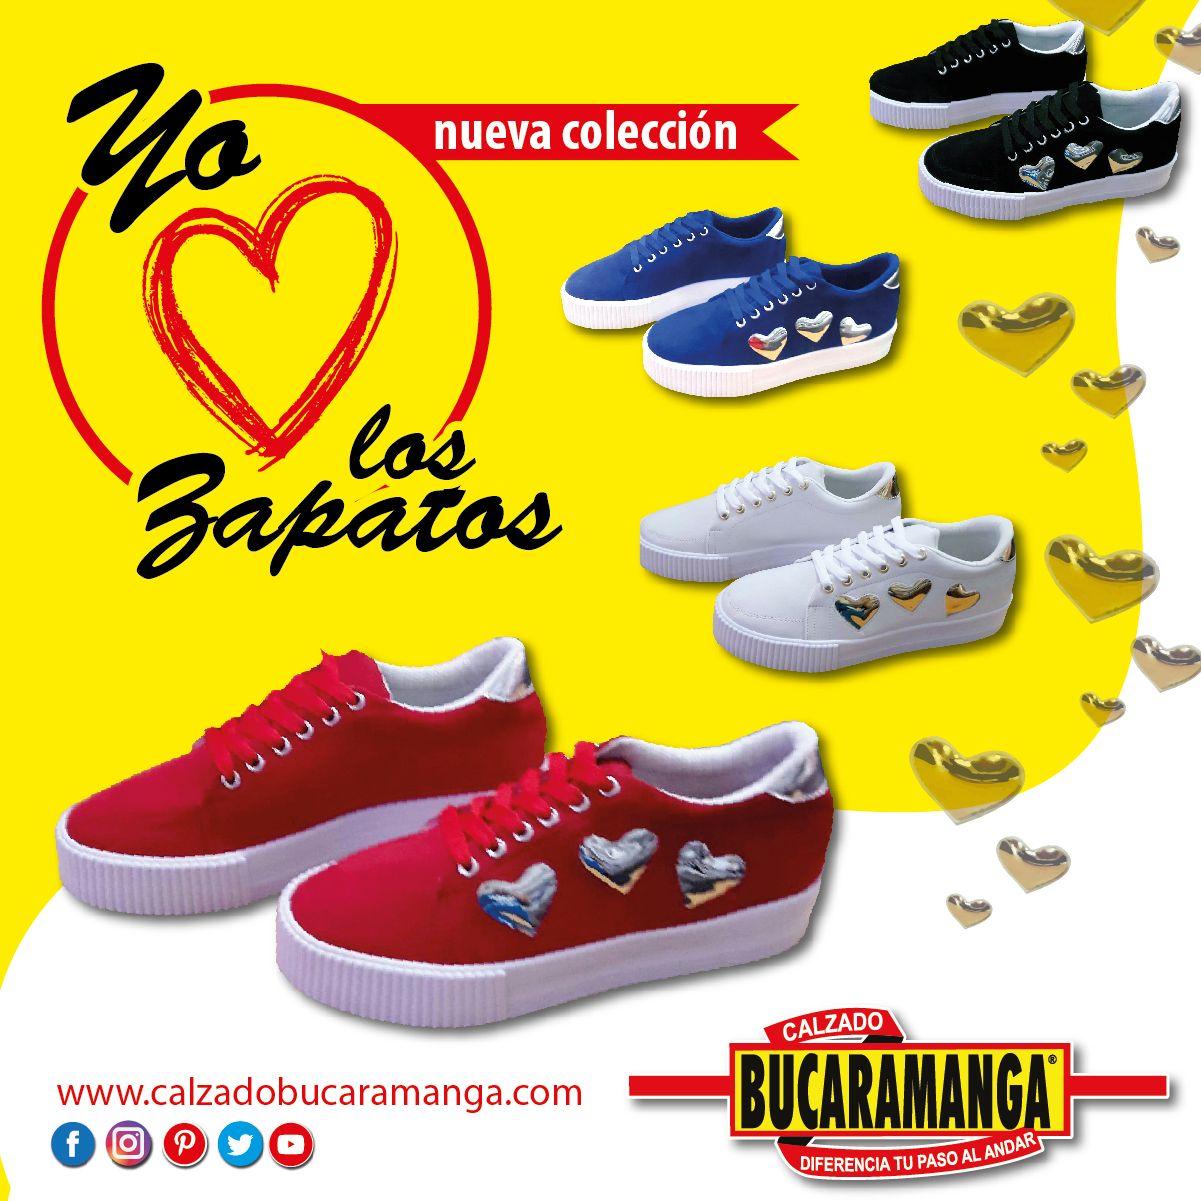 Calzado Bucaramanga Tiene Nueva Colecci N Yo Amo Los Zapatos  # Muebles Safari Bucaramanga